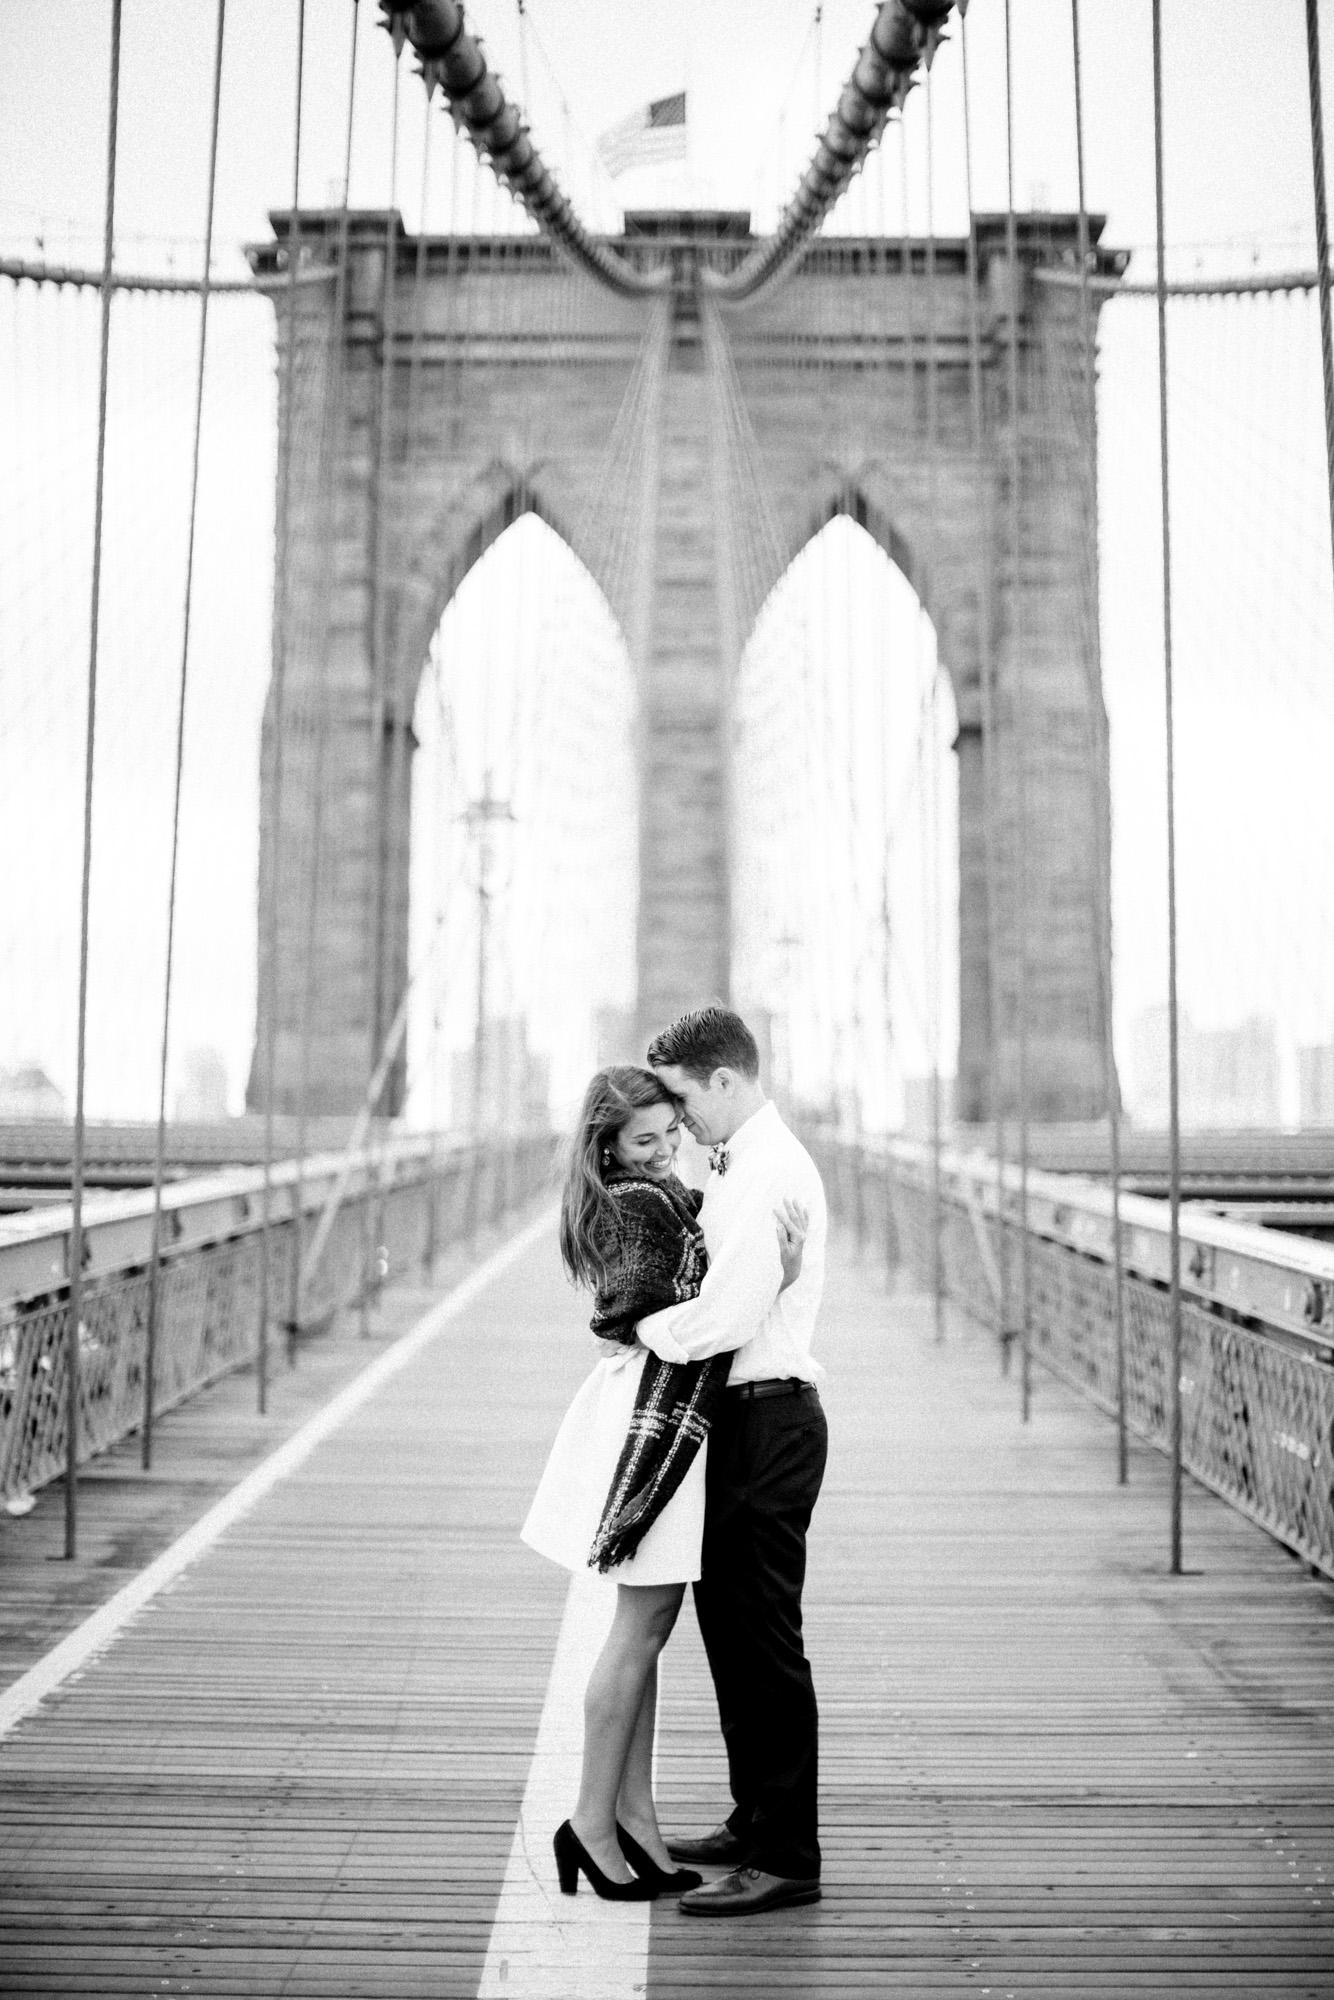 new-york-city-wedding-photography-hunter-ryan-photo-04895.jpg